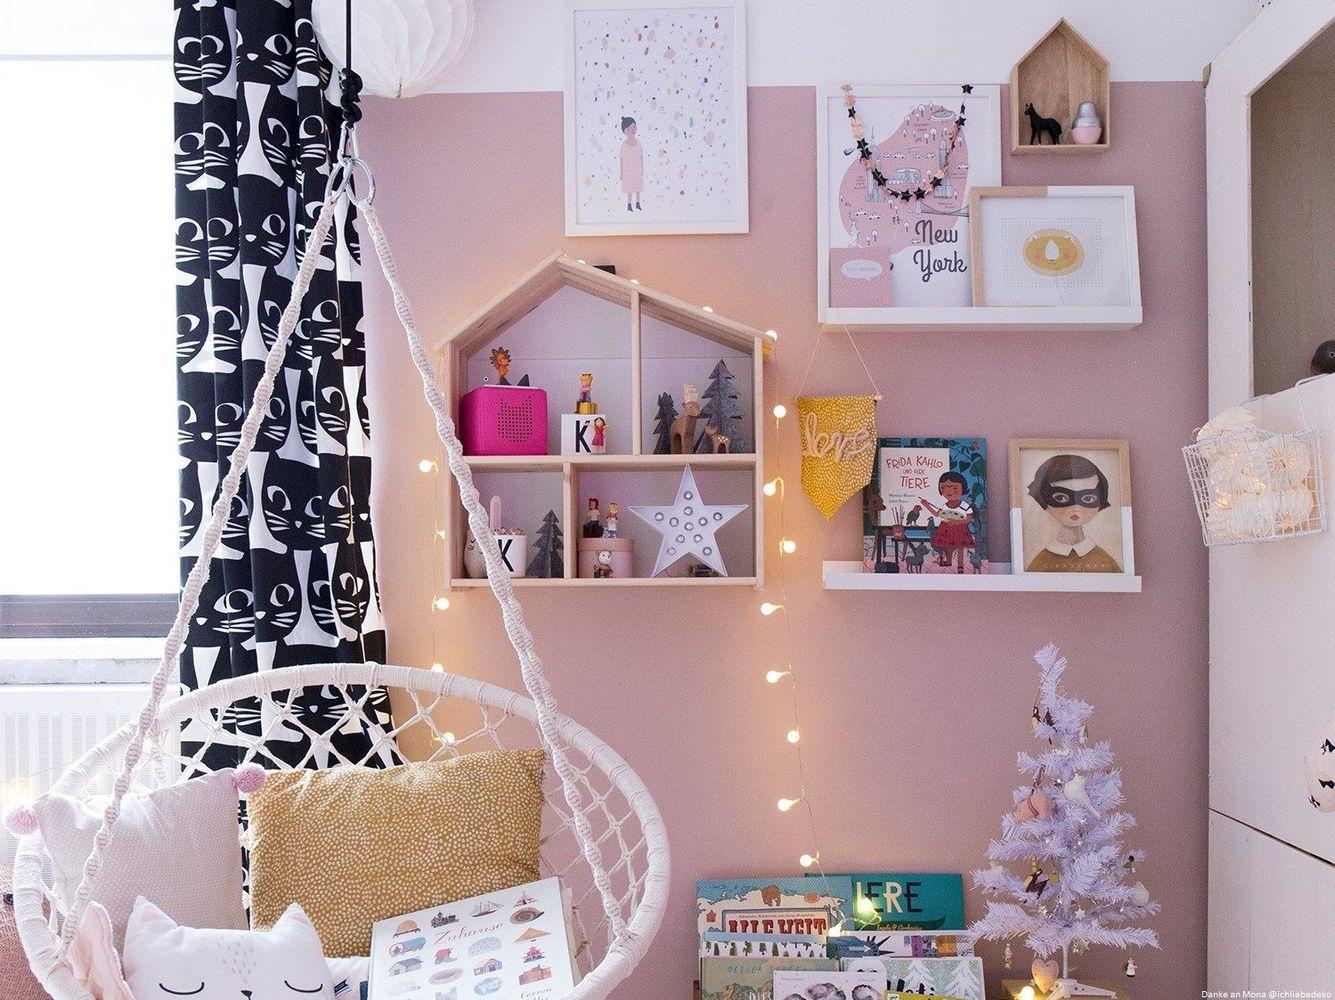 Full Size of Wandfarbe Rosa Farbfreude Kinderzimmer In Altrosa I Kolorat Küche Wohnzimmer Wandfarbe Rosa